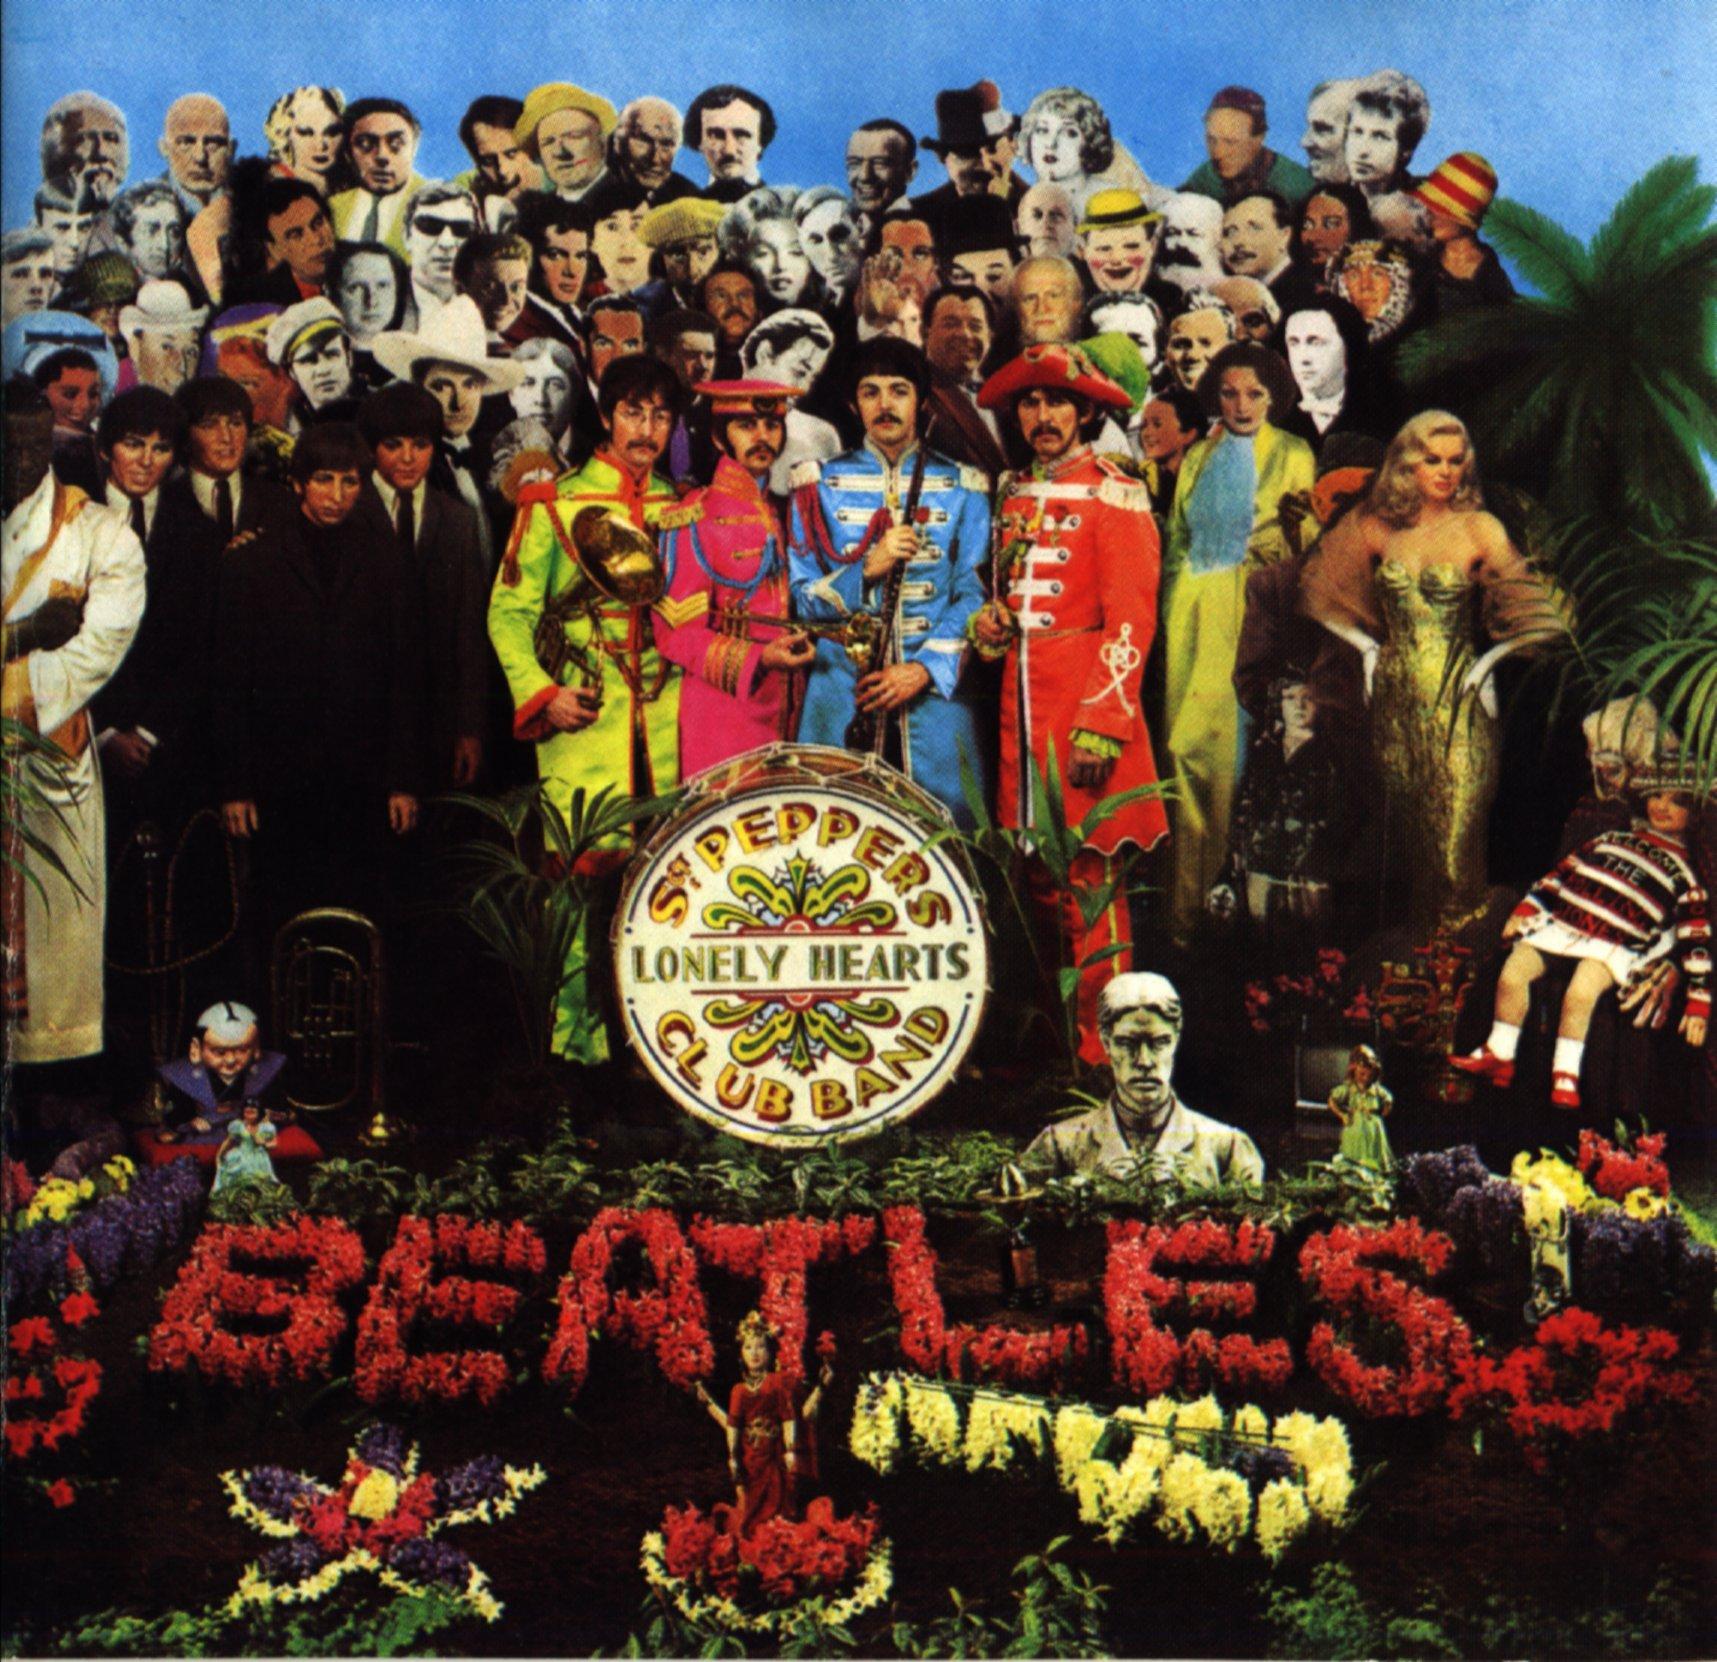 Top Ten Fab Pictures: Hey Dullblog, The Beatles Fan BlogThe Fab Five: My Top 5